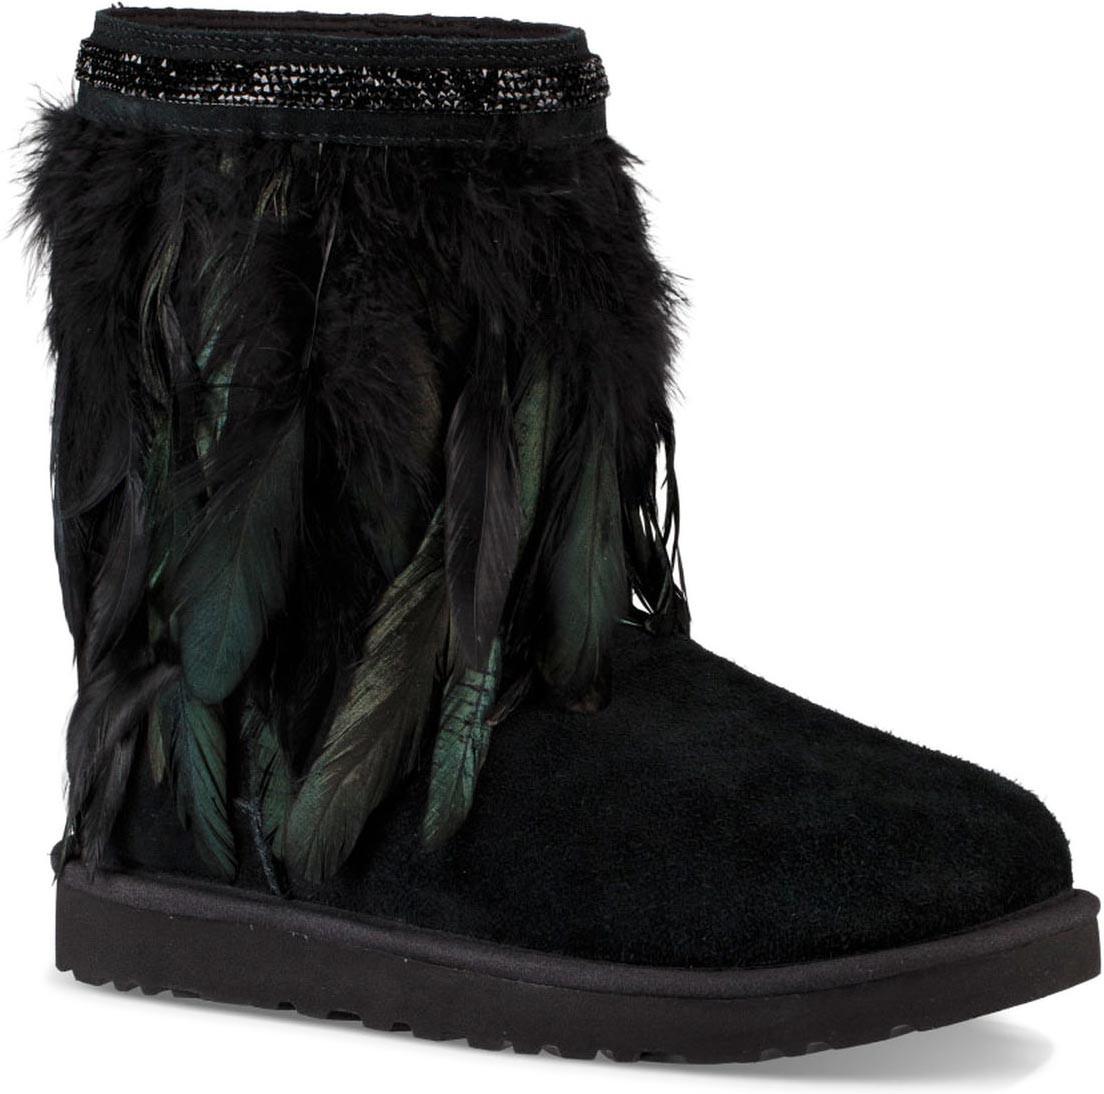 ugg womens classic short leather boots feather black rh turn keymortgage com